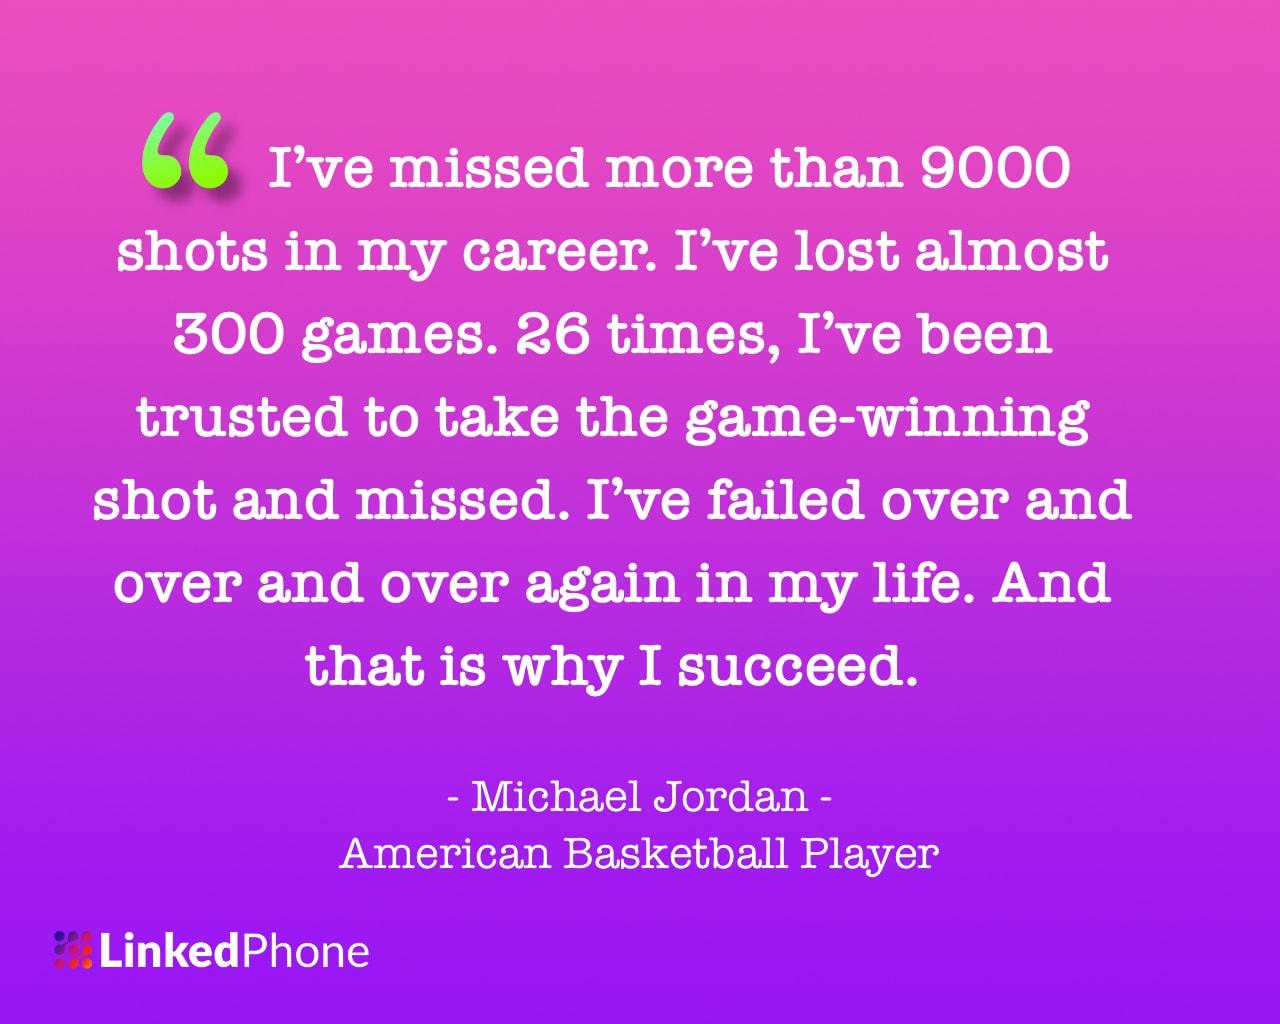 Michael Jordan - Motivational Inspirational Quotes and Sayings